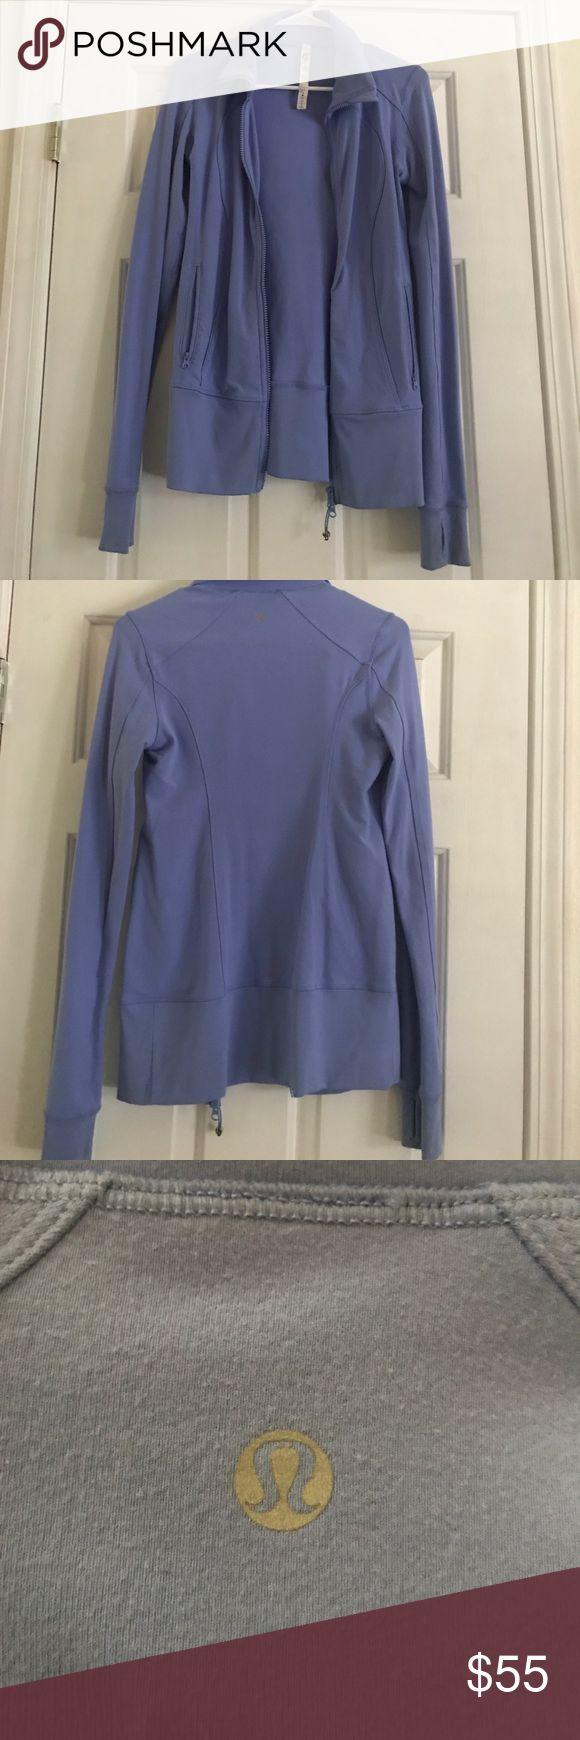 Lululemon Hoodie Double zip lululemon hoodie.  Hardly worn Sz 4 lululemon athletica Tops Sweatshirts & Hoodies